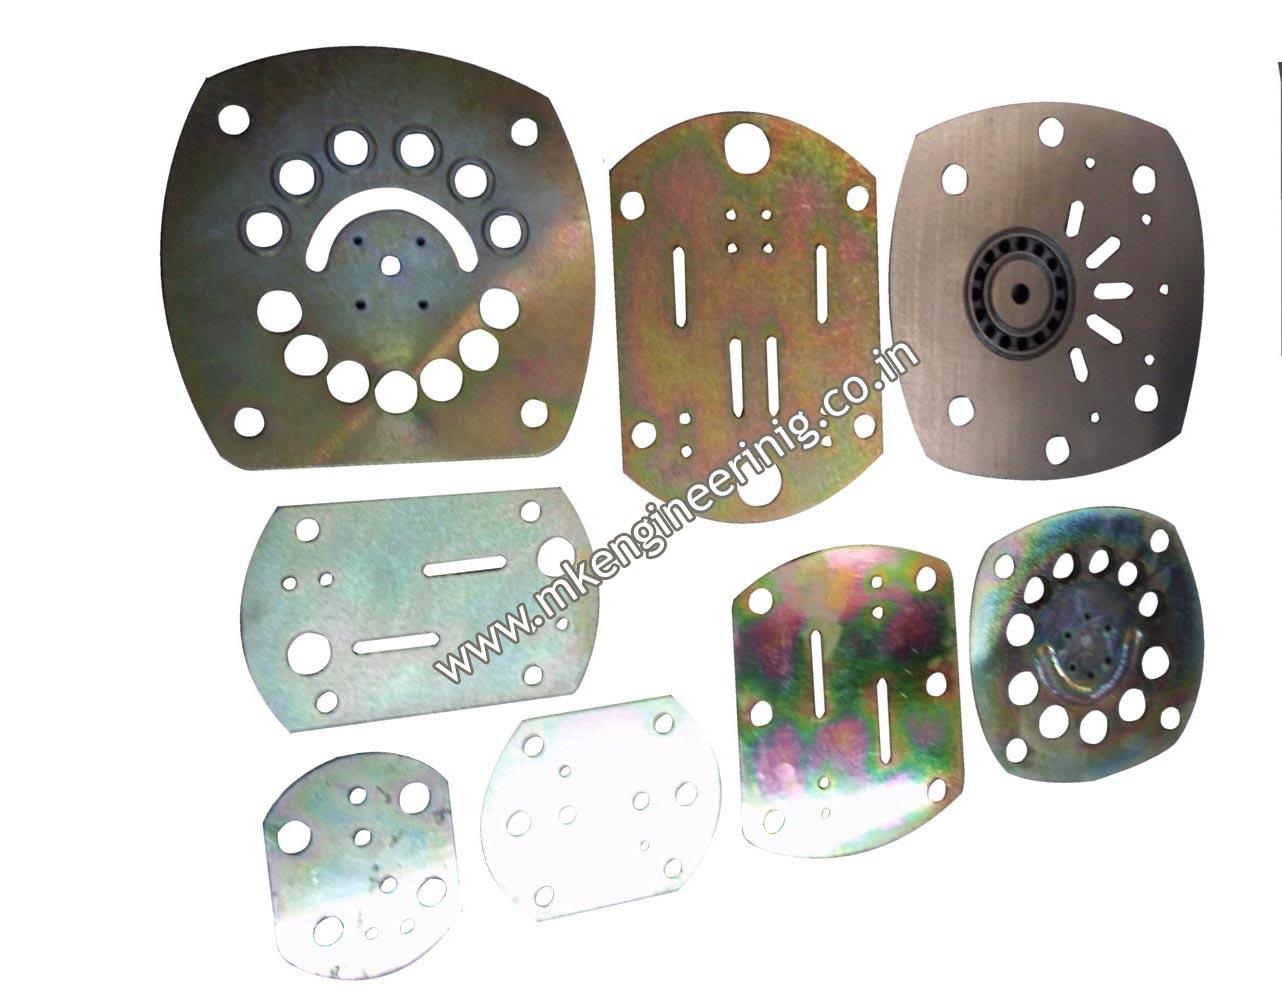 Spacer Plates Supplier in Nigeria, South Africa, Egypt, Algeria, Morocco, Angola, Sudan, Kenya, Ethiopia, Tanzania, Tunisia , DR Congo, Ghana